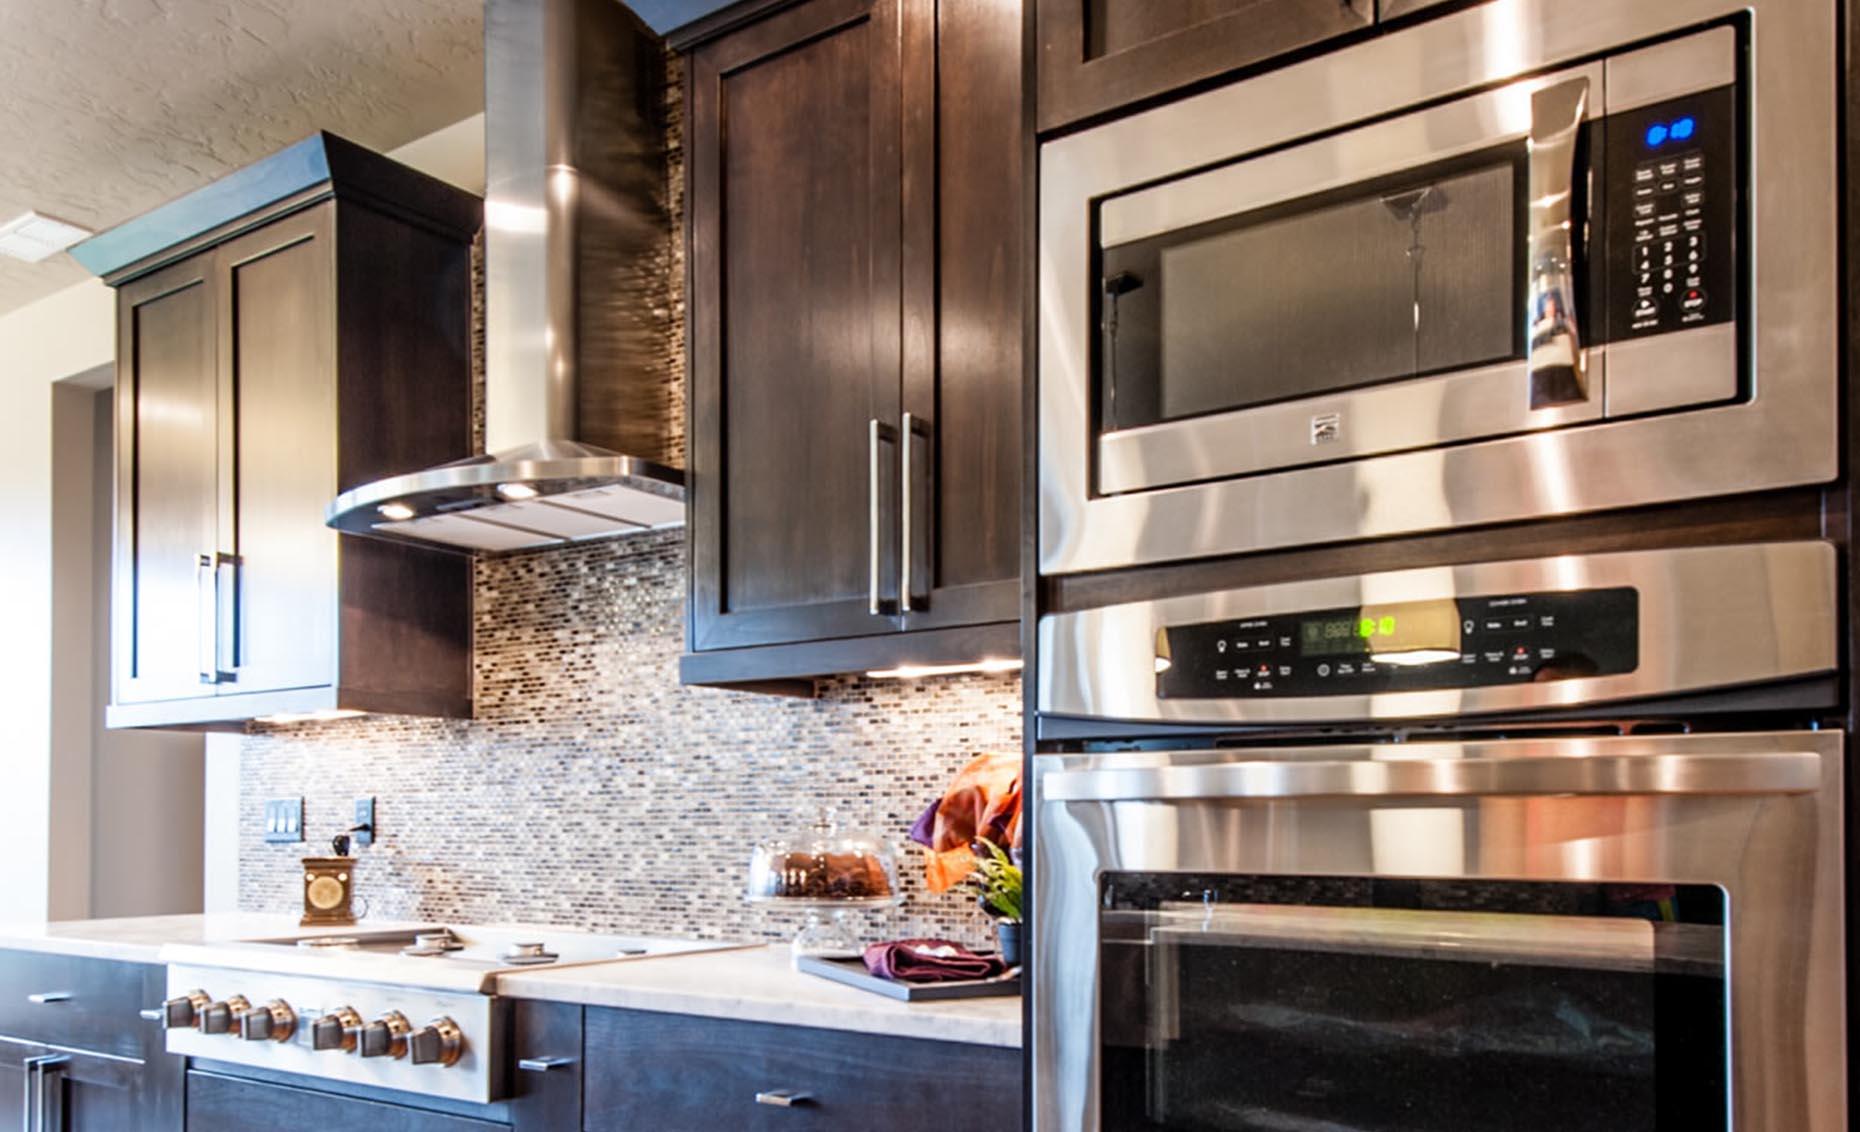 The Braveland House Kitchen Appliances